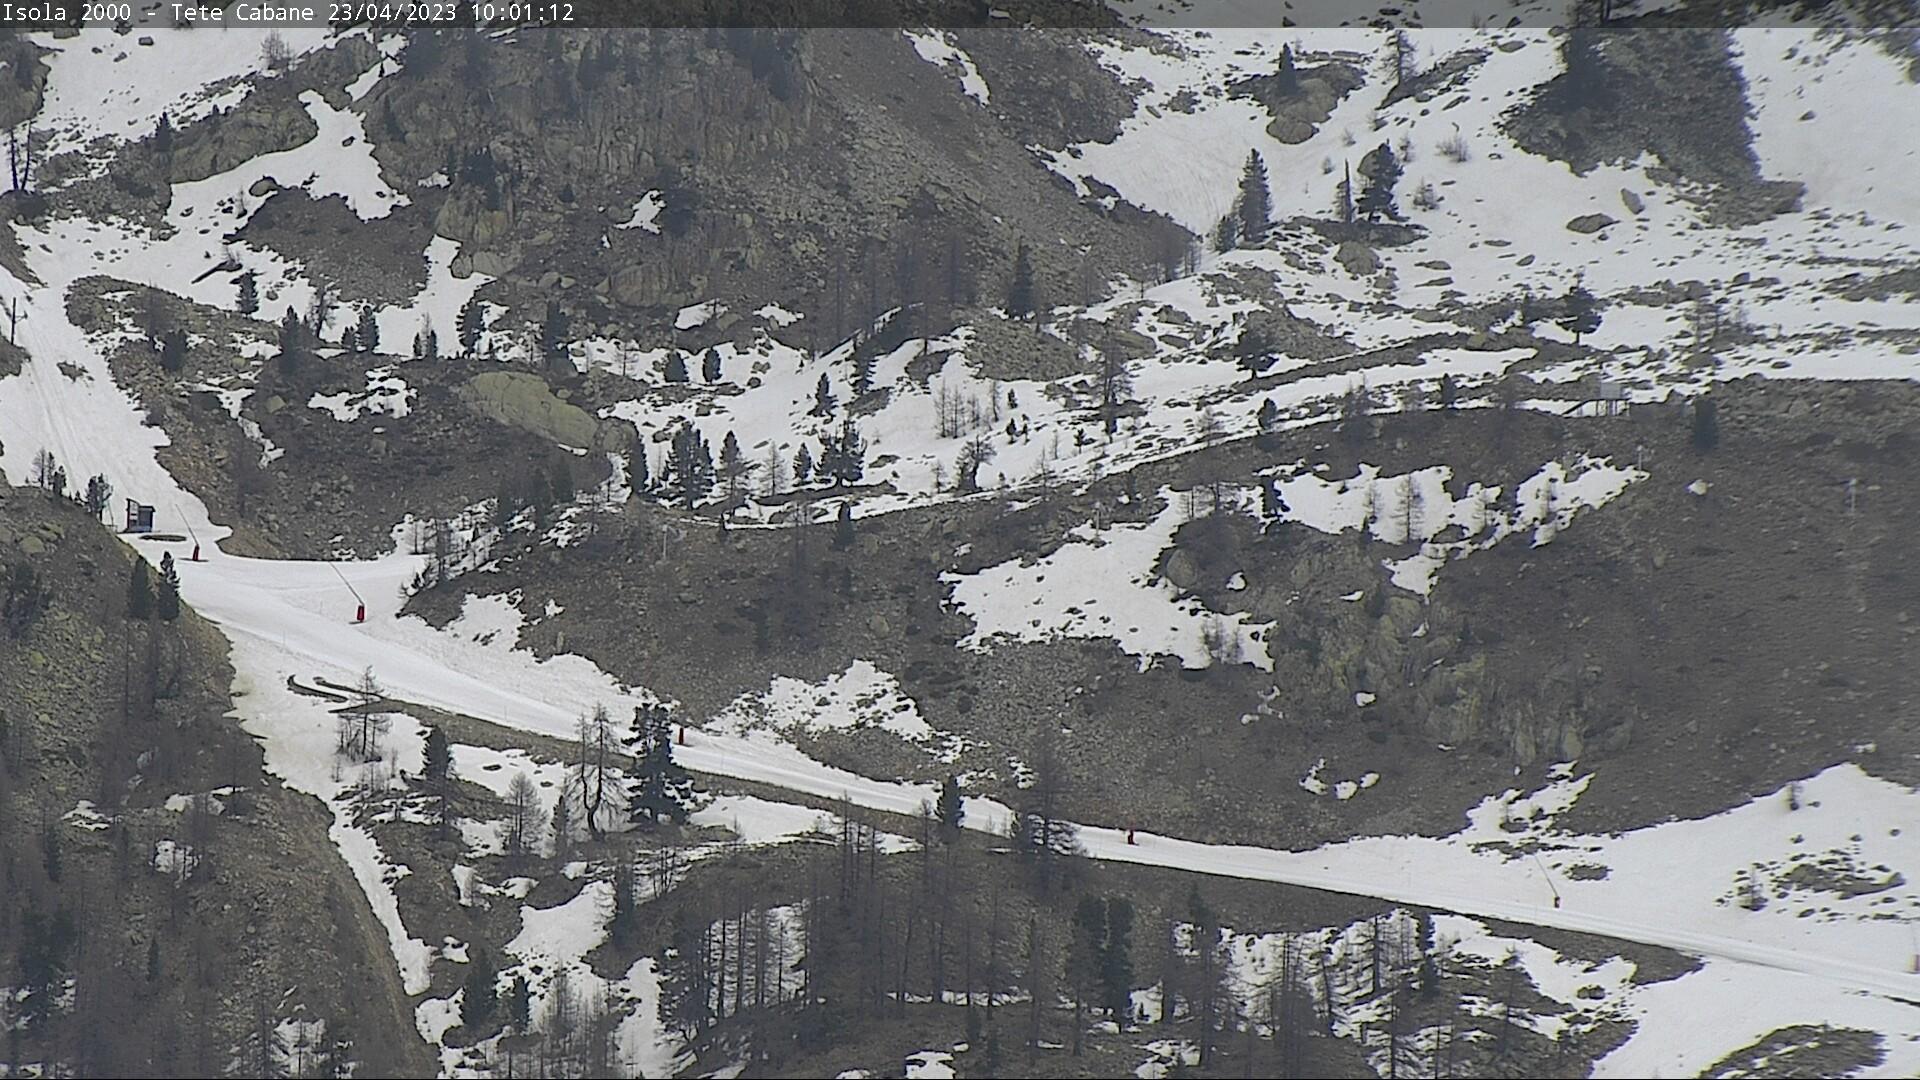 Raquette neige isola 2000 webcam